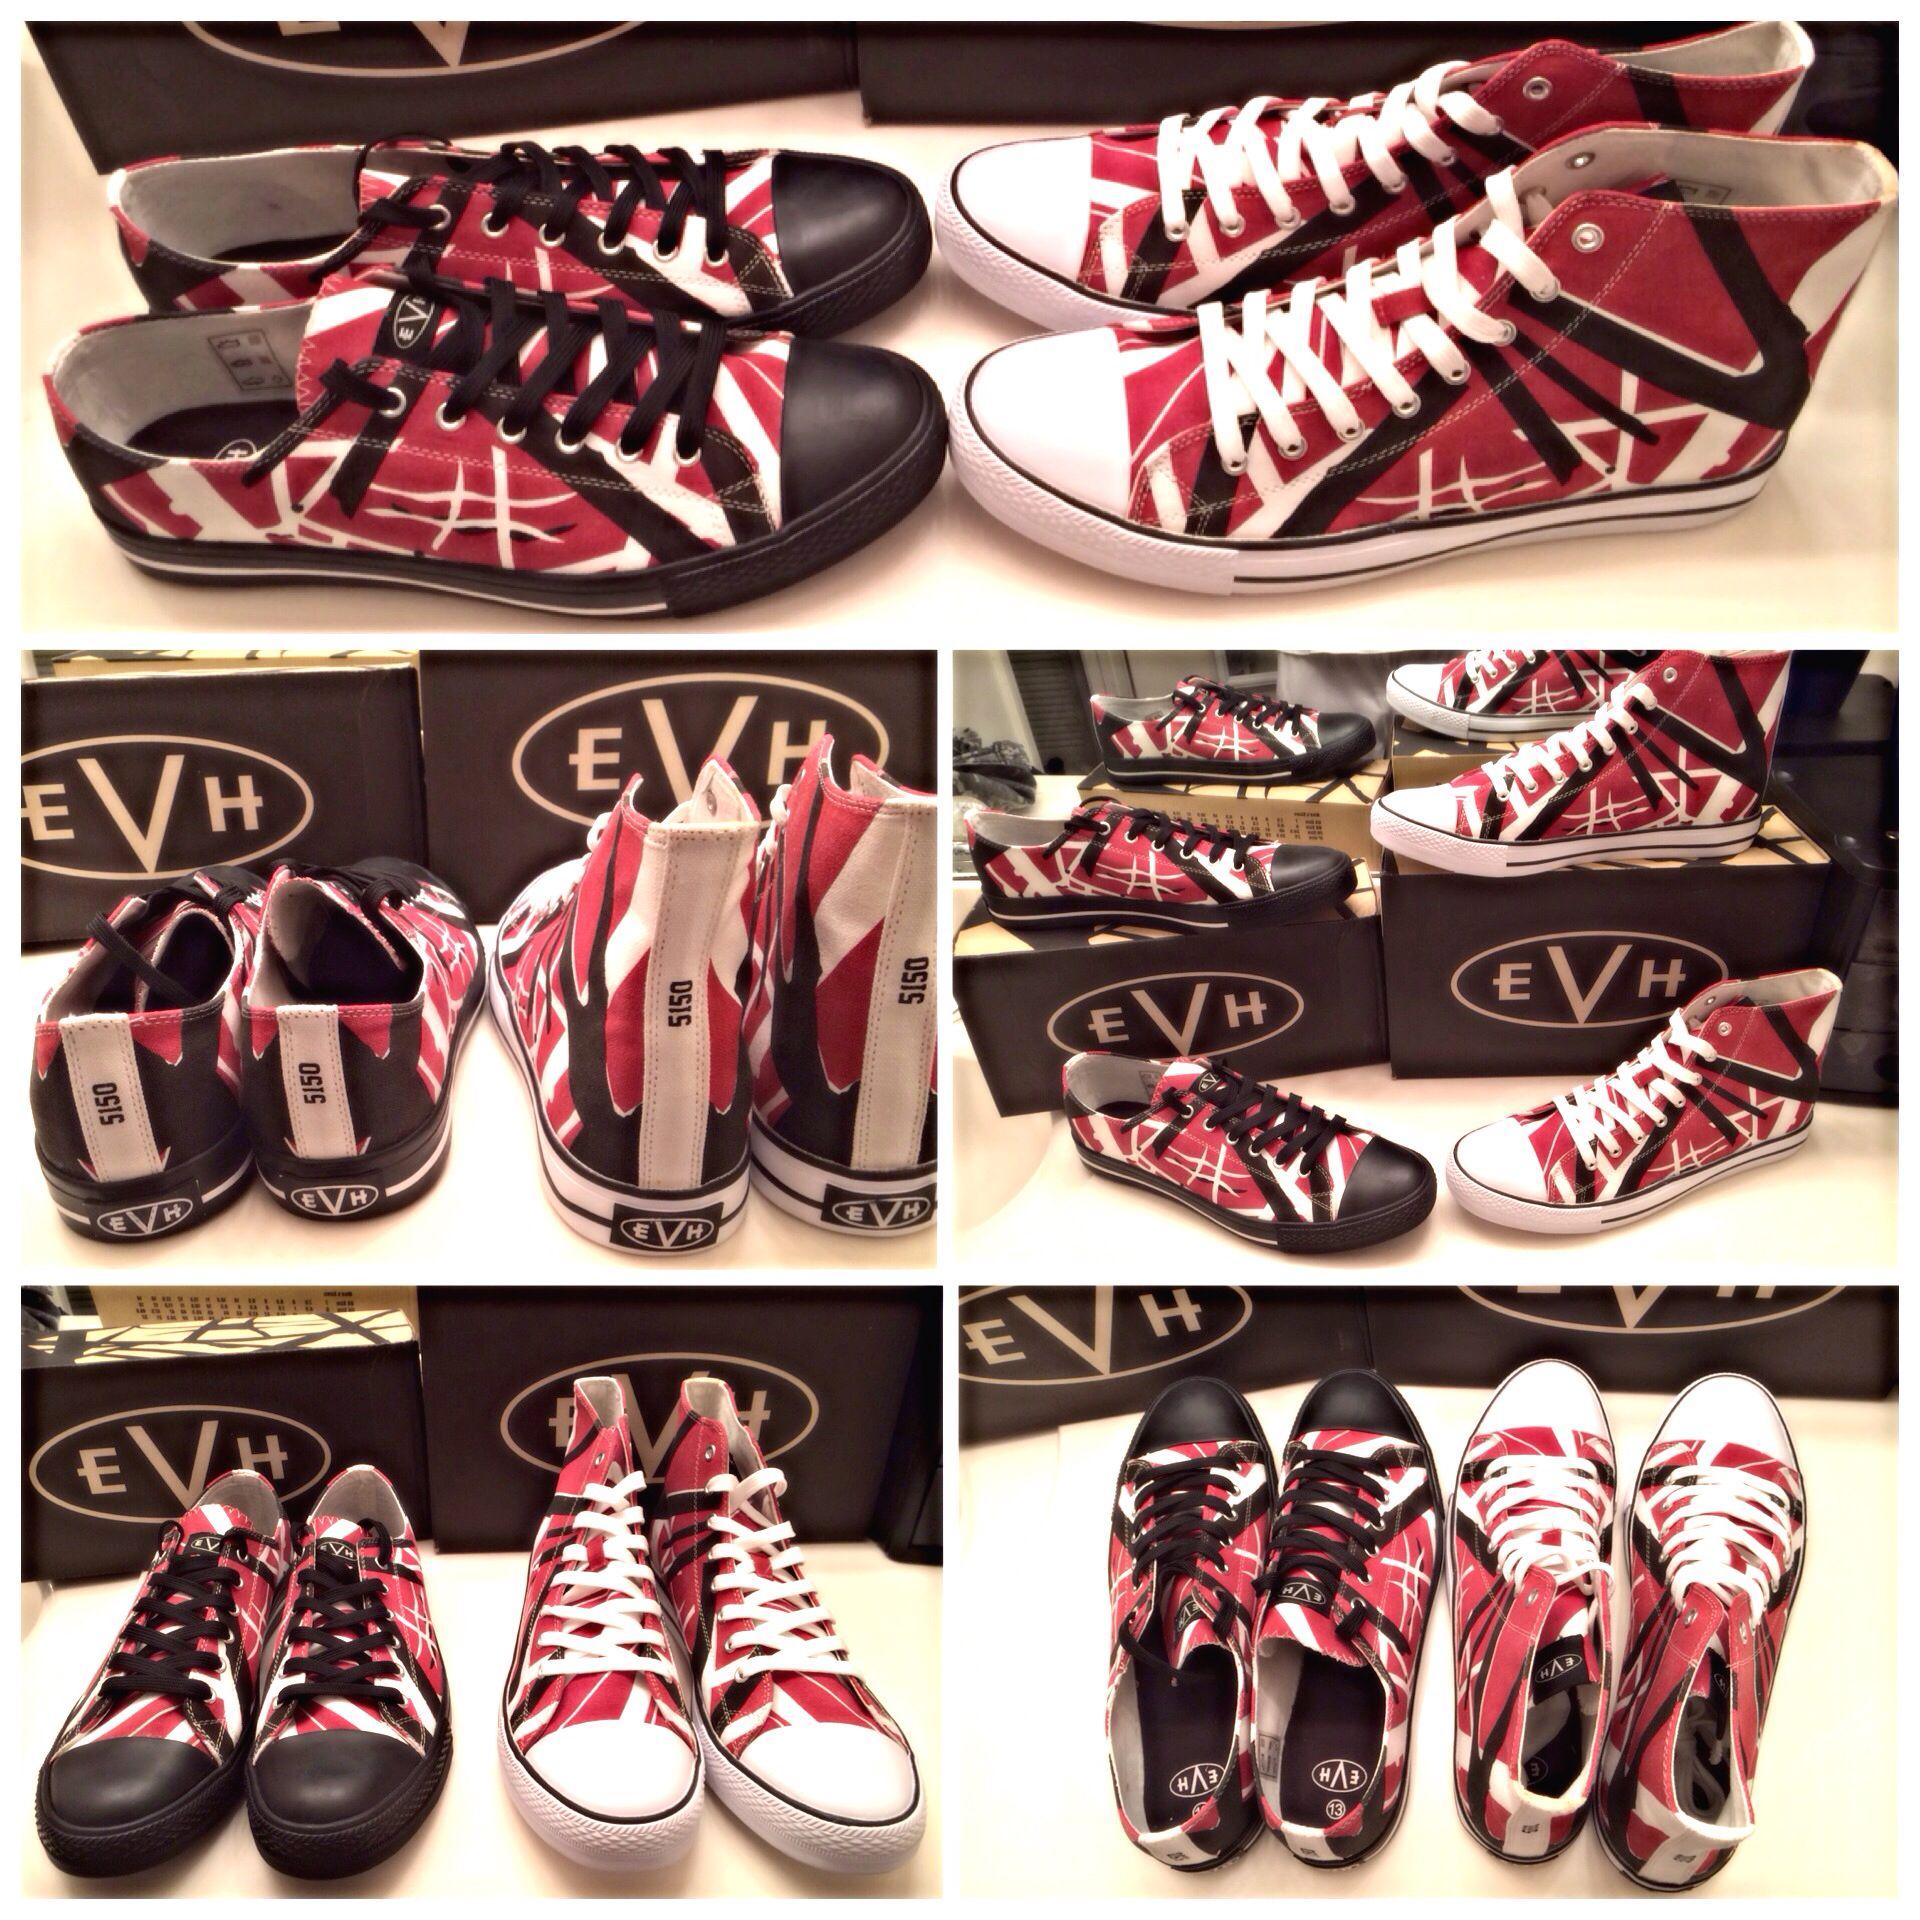 My New Eddie Van Halen Kicks Vanhalen Evh Eddievanhalen Evhgear Stripes Frankenstrat Van Halen Vans Old Skool Sneaker Eddie Van Halen